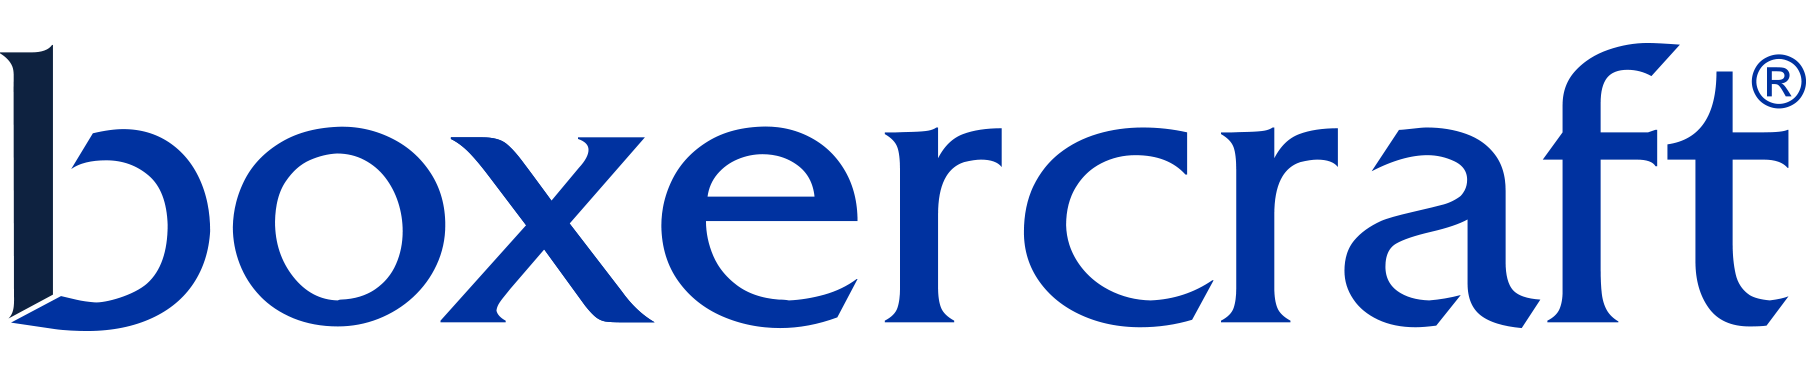 boxercraft logo.png